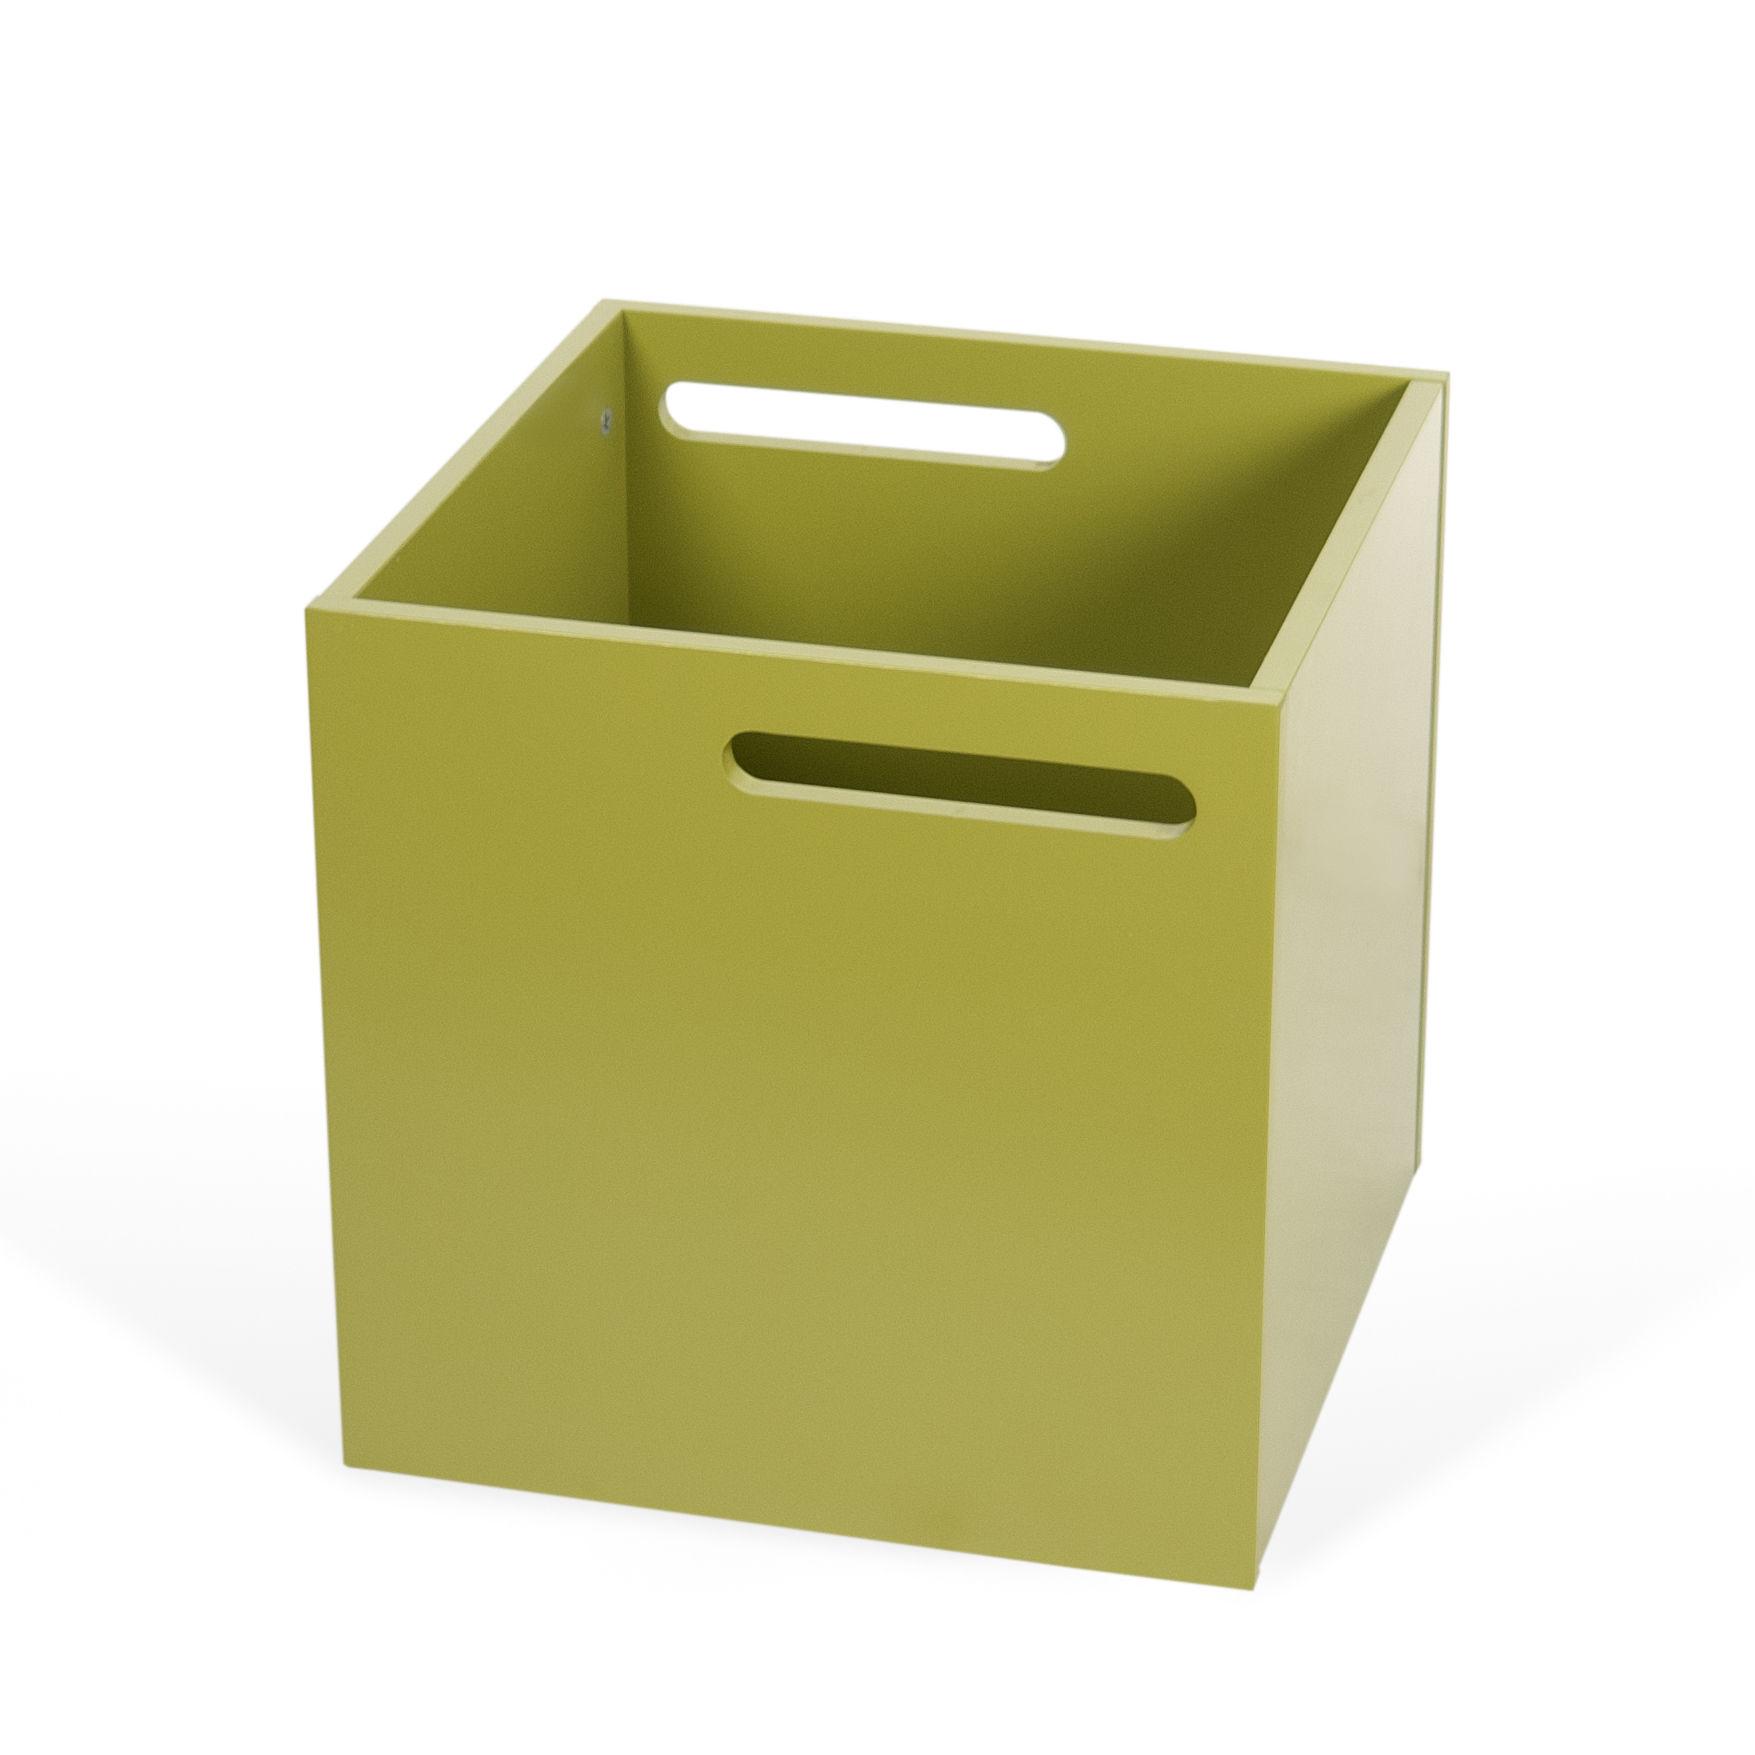 caisson pour biblioth que rotterdam vert pop up home. Black Bedroom Furniture Sets. Home Design Ideas